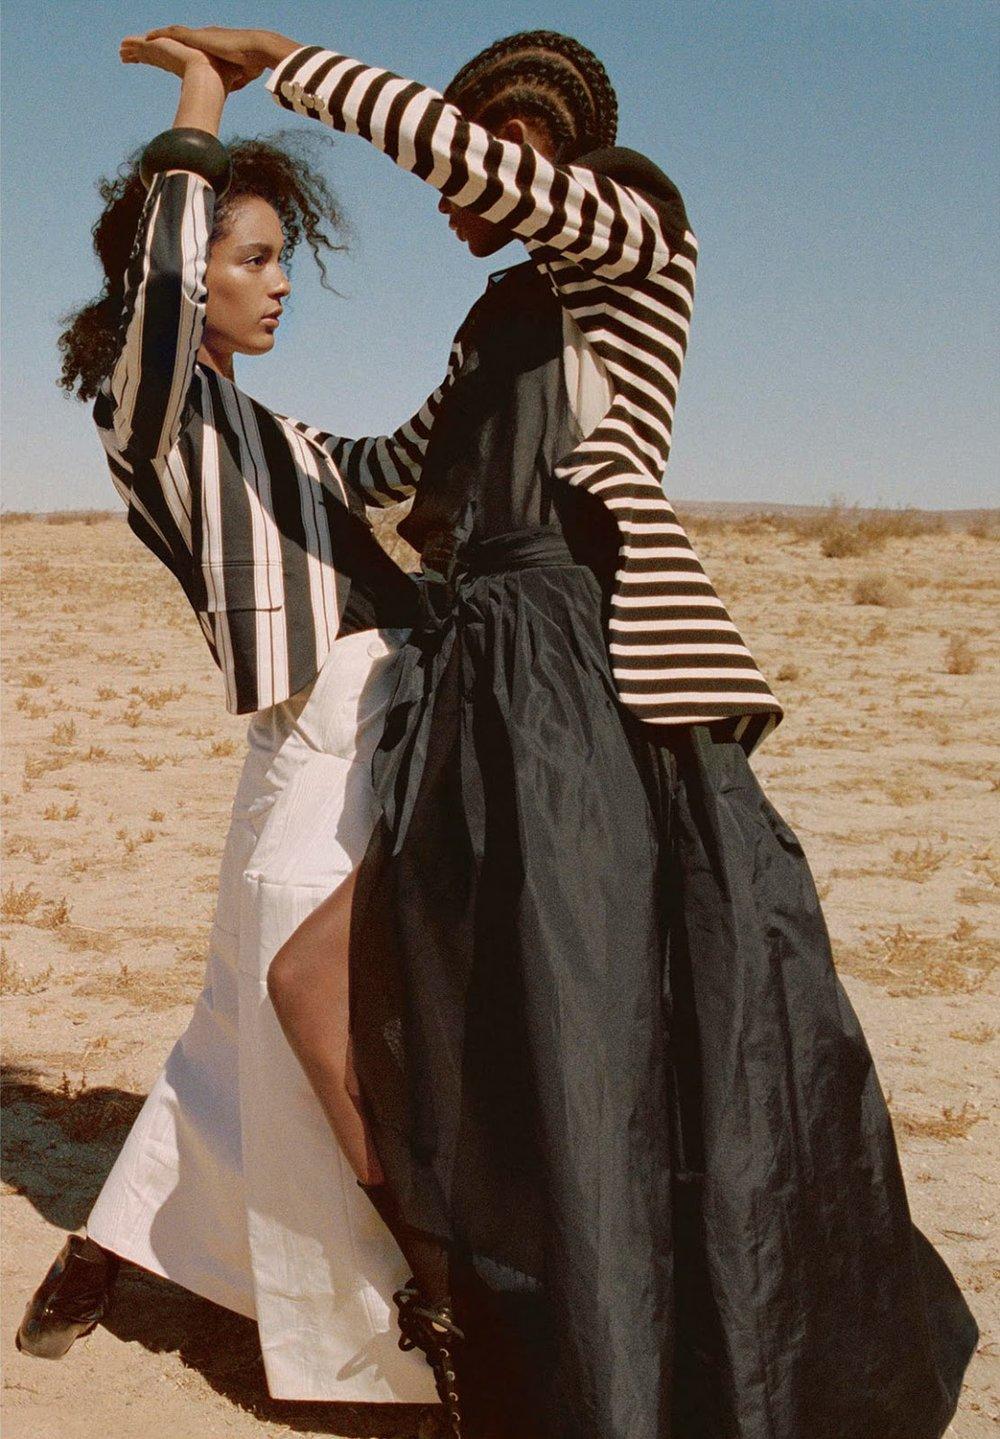 Elibeidy Martinez + Luisana Gonzalez by Yelena Yemchuk for Porter 30 Winter 2018 (8).jpg